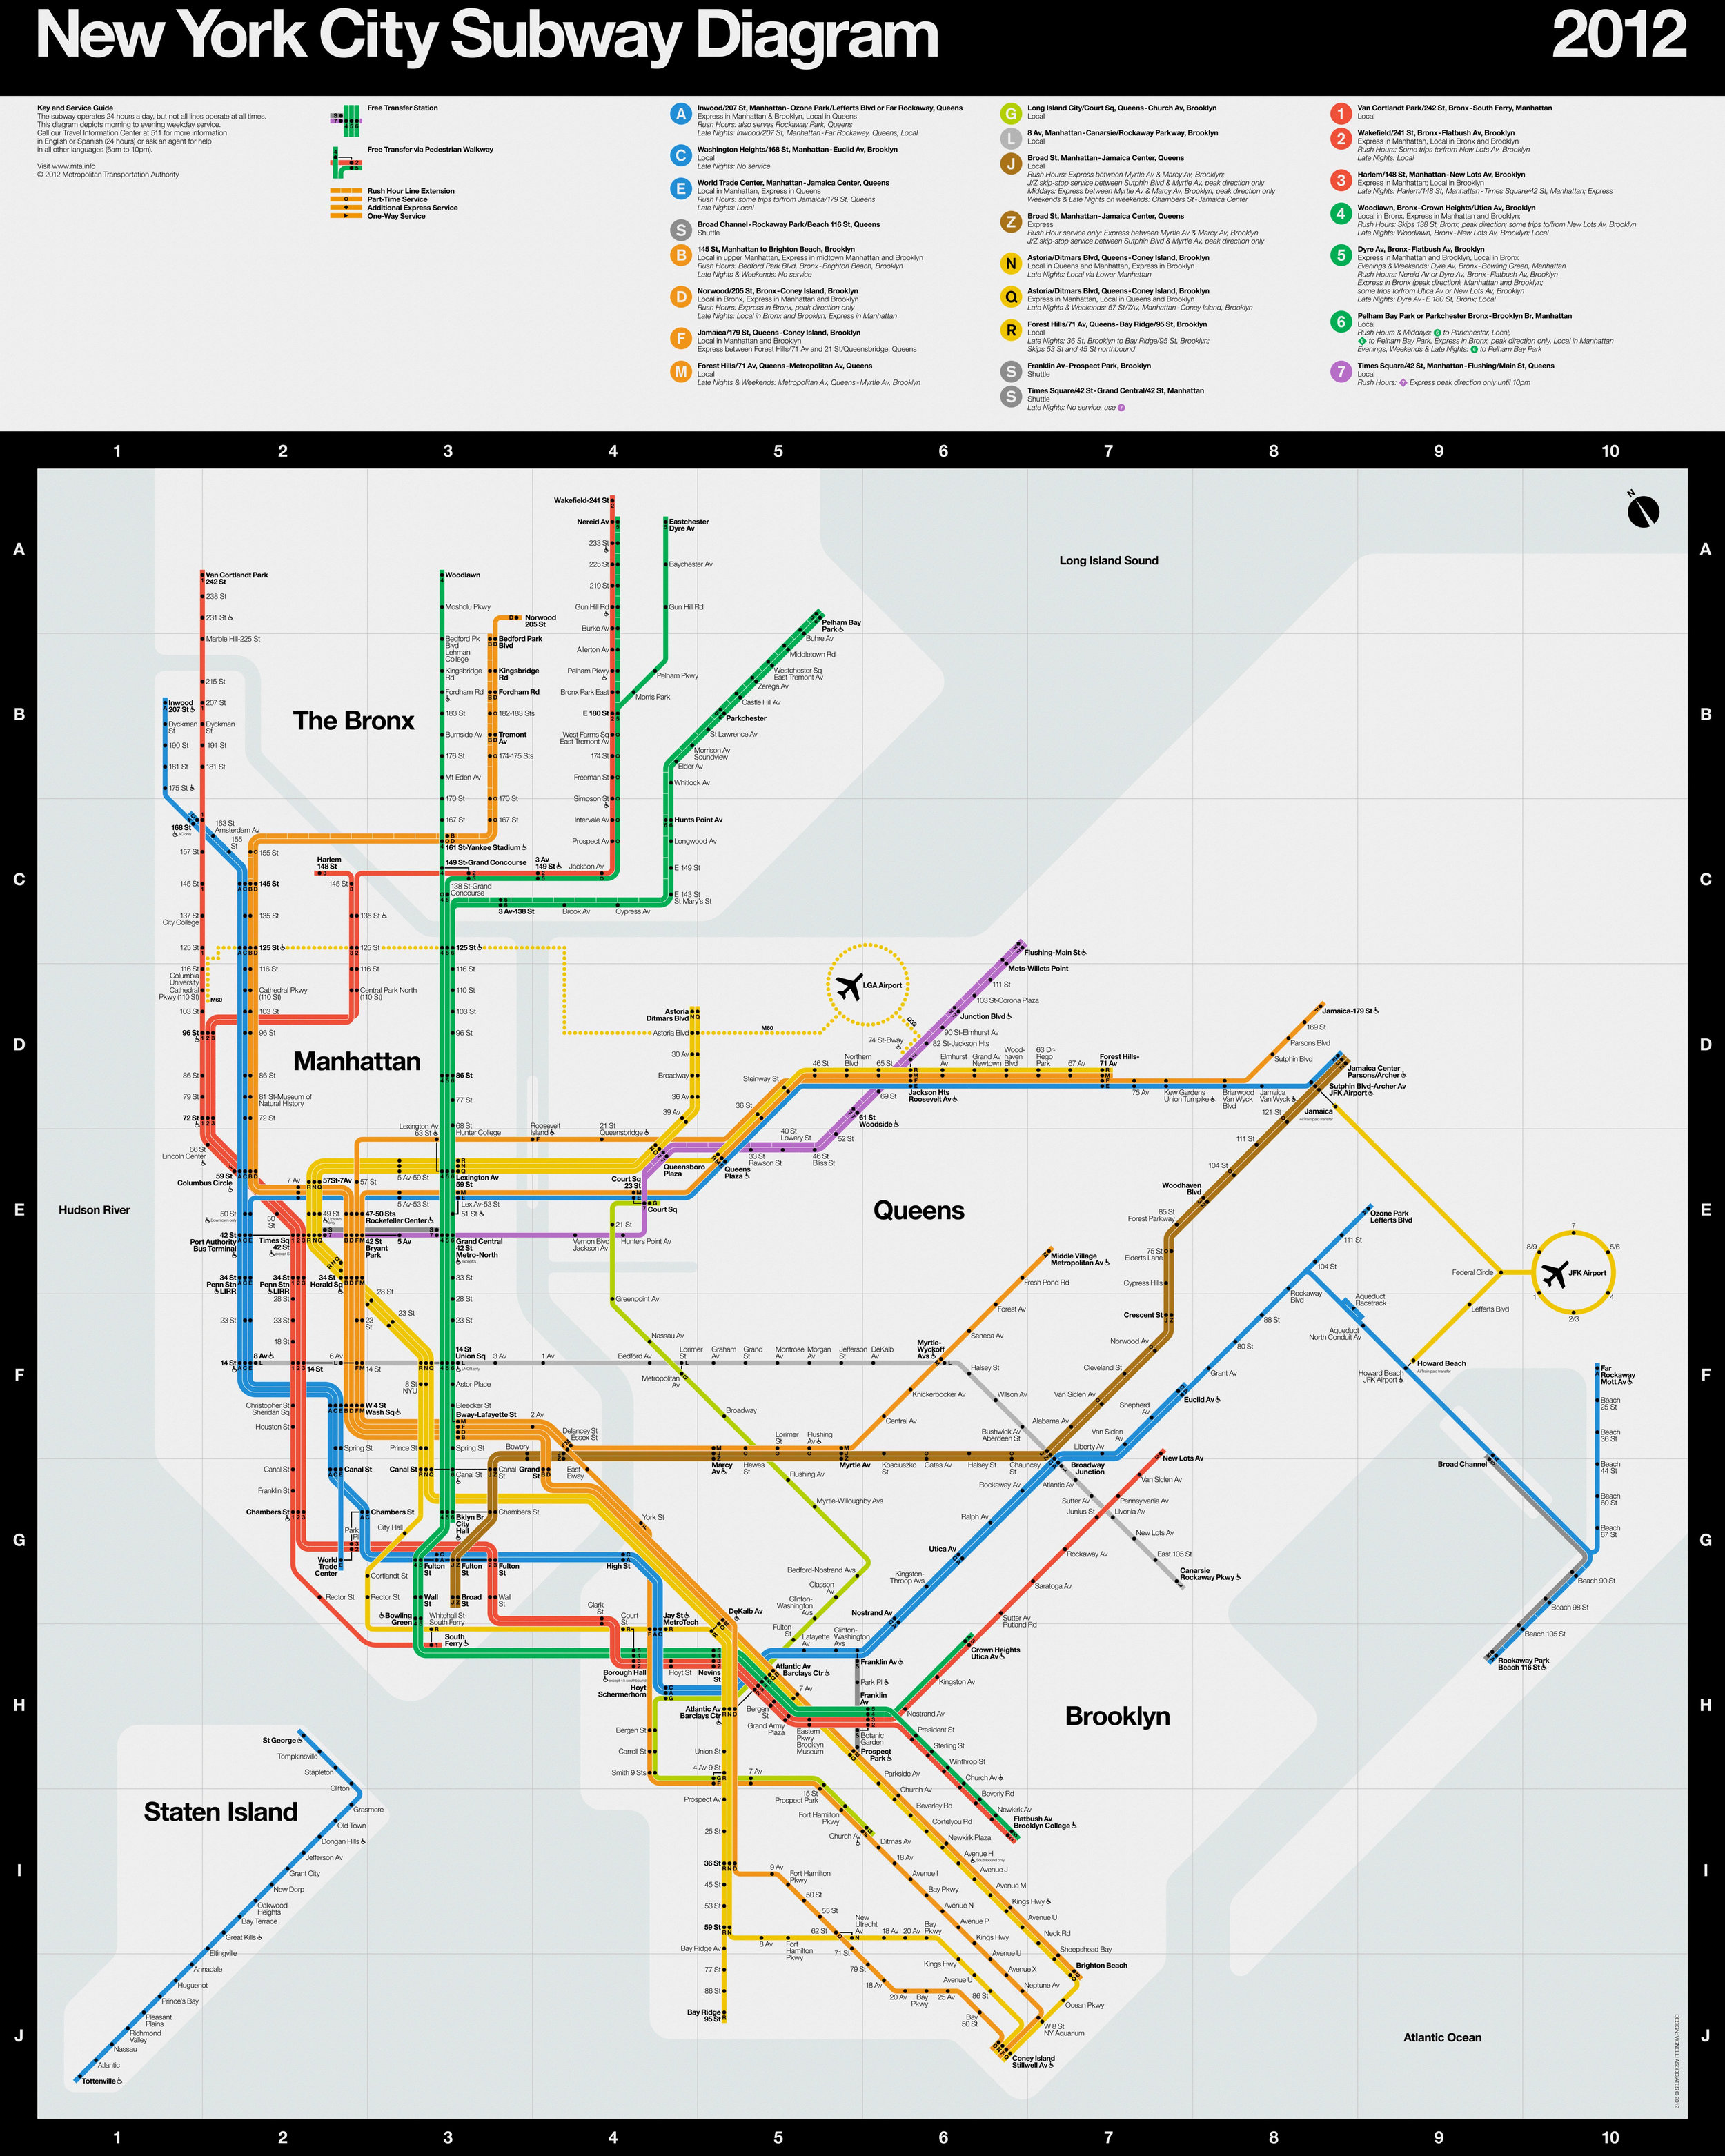 New York City Subway Diagram 2012.jpg